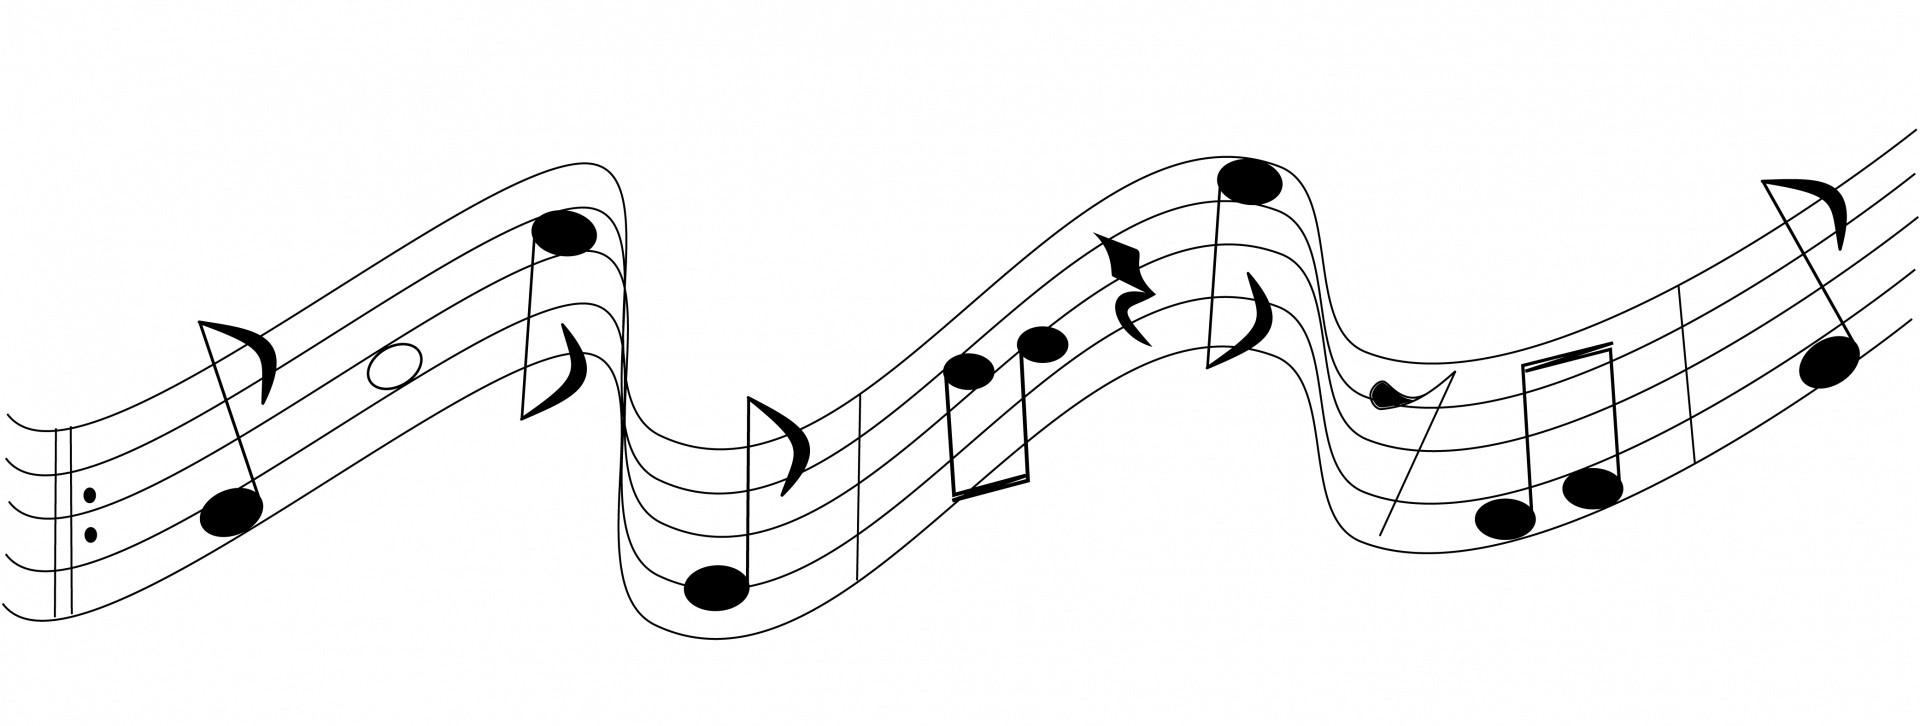 Scuola di Musica  – Venerdì 13 Ottobre